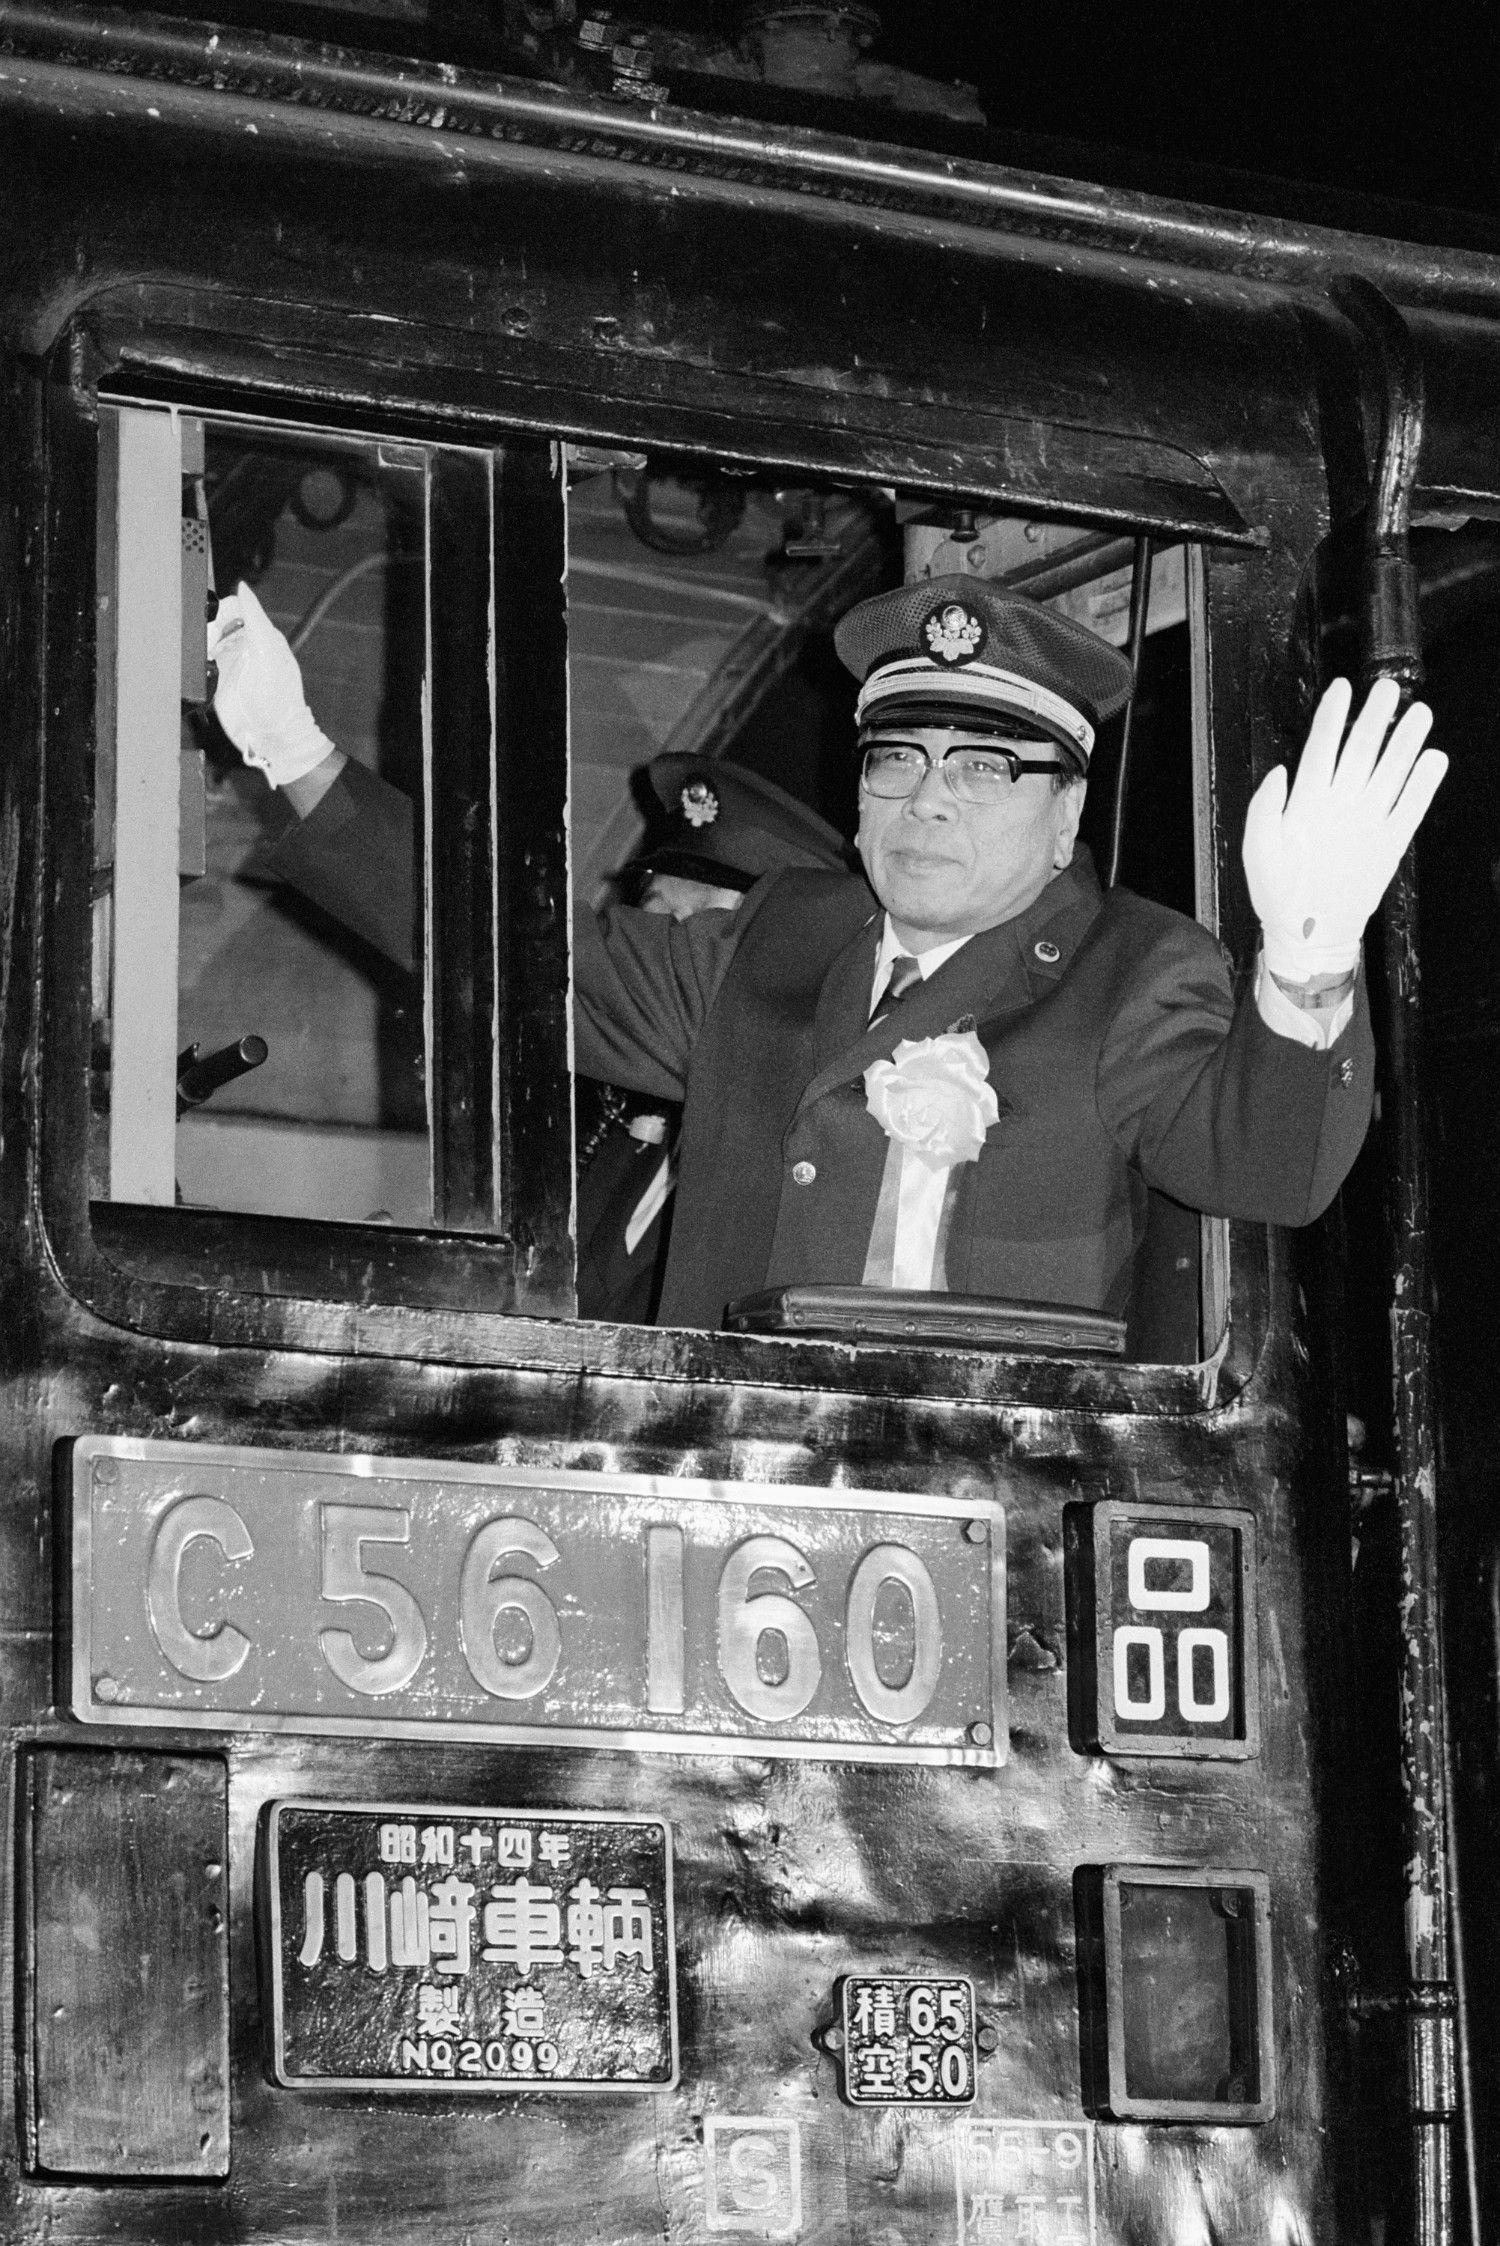 C56に乗車する杉浦喬也総裁 ©共同通信社